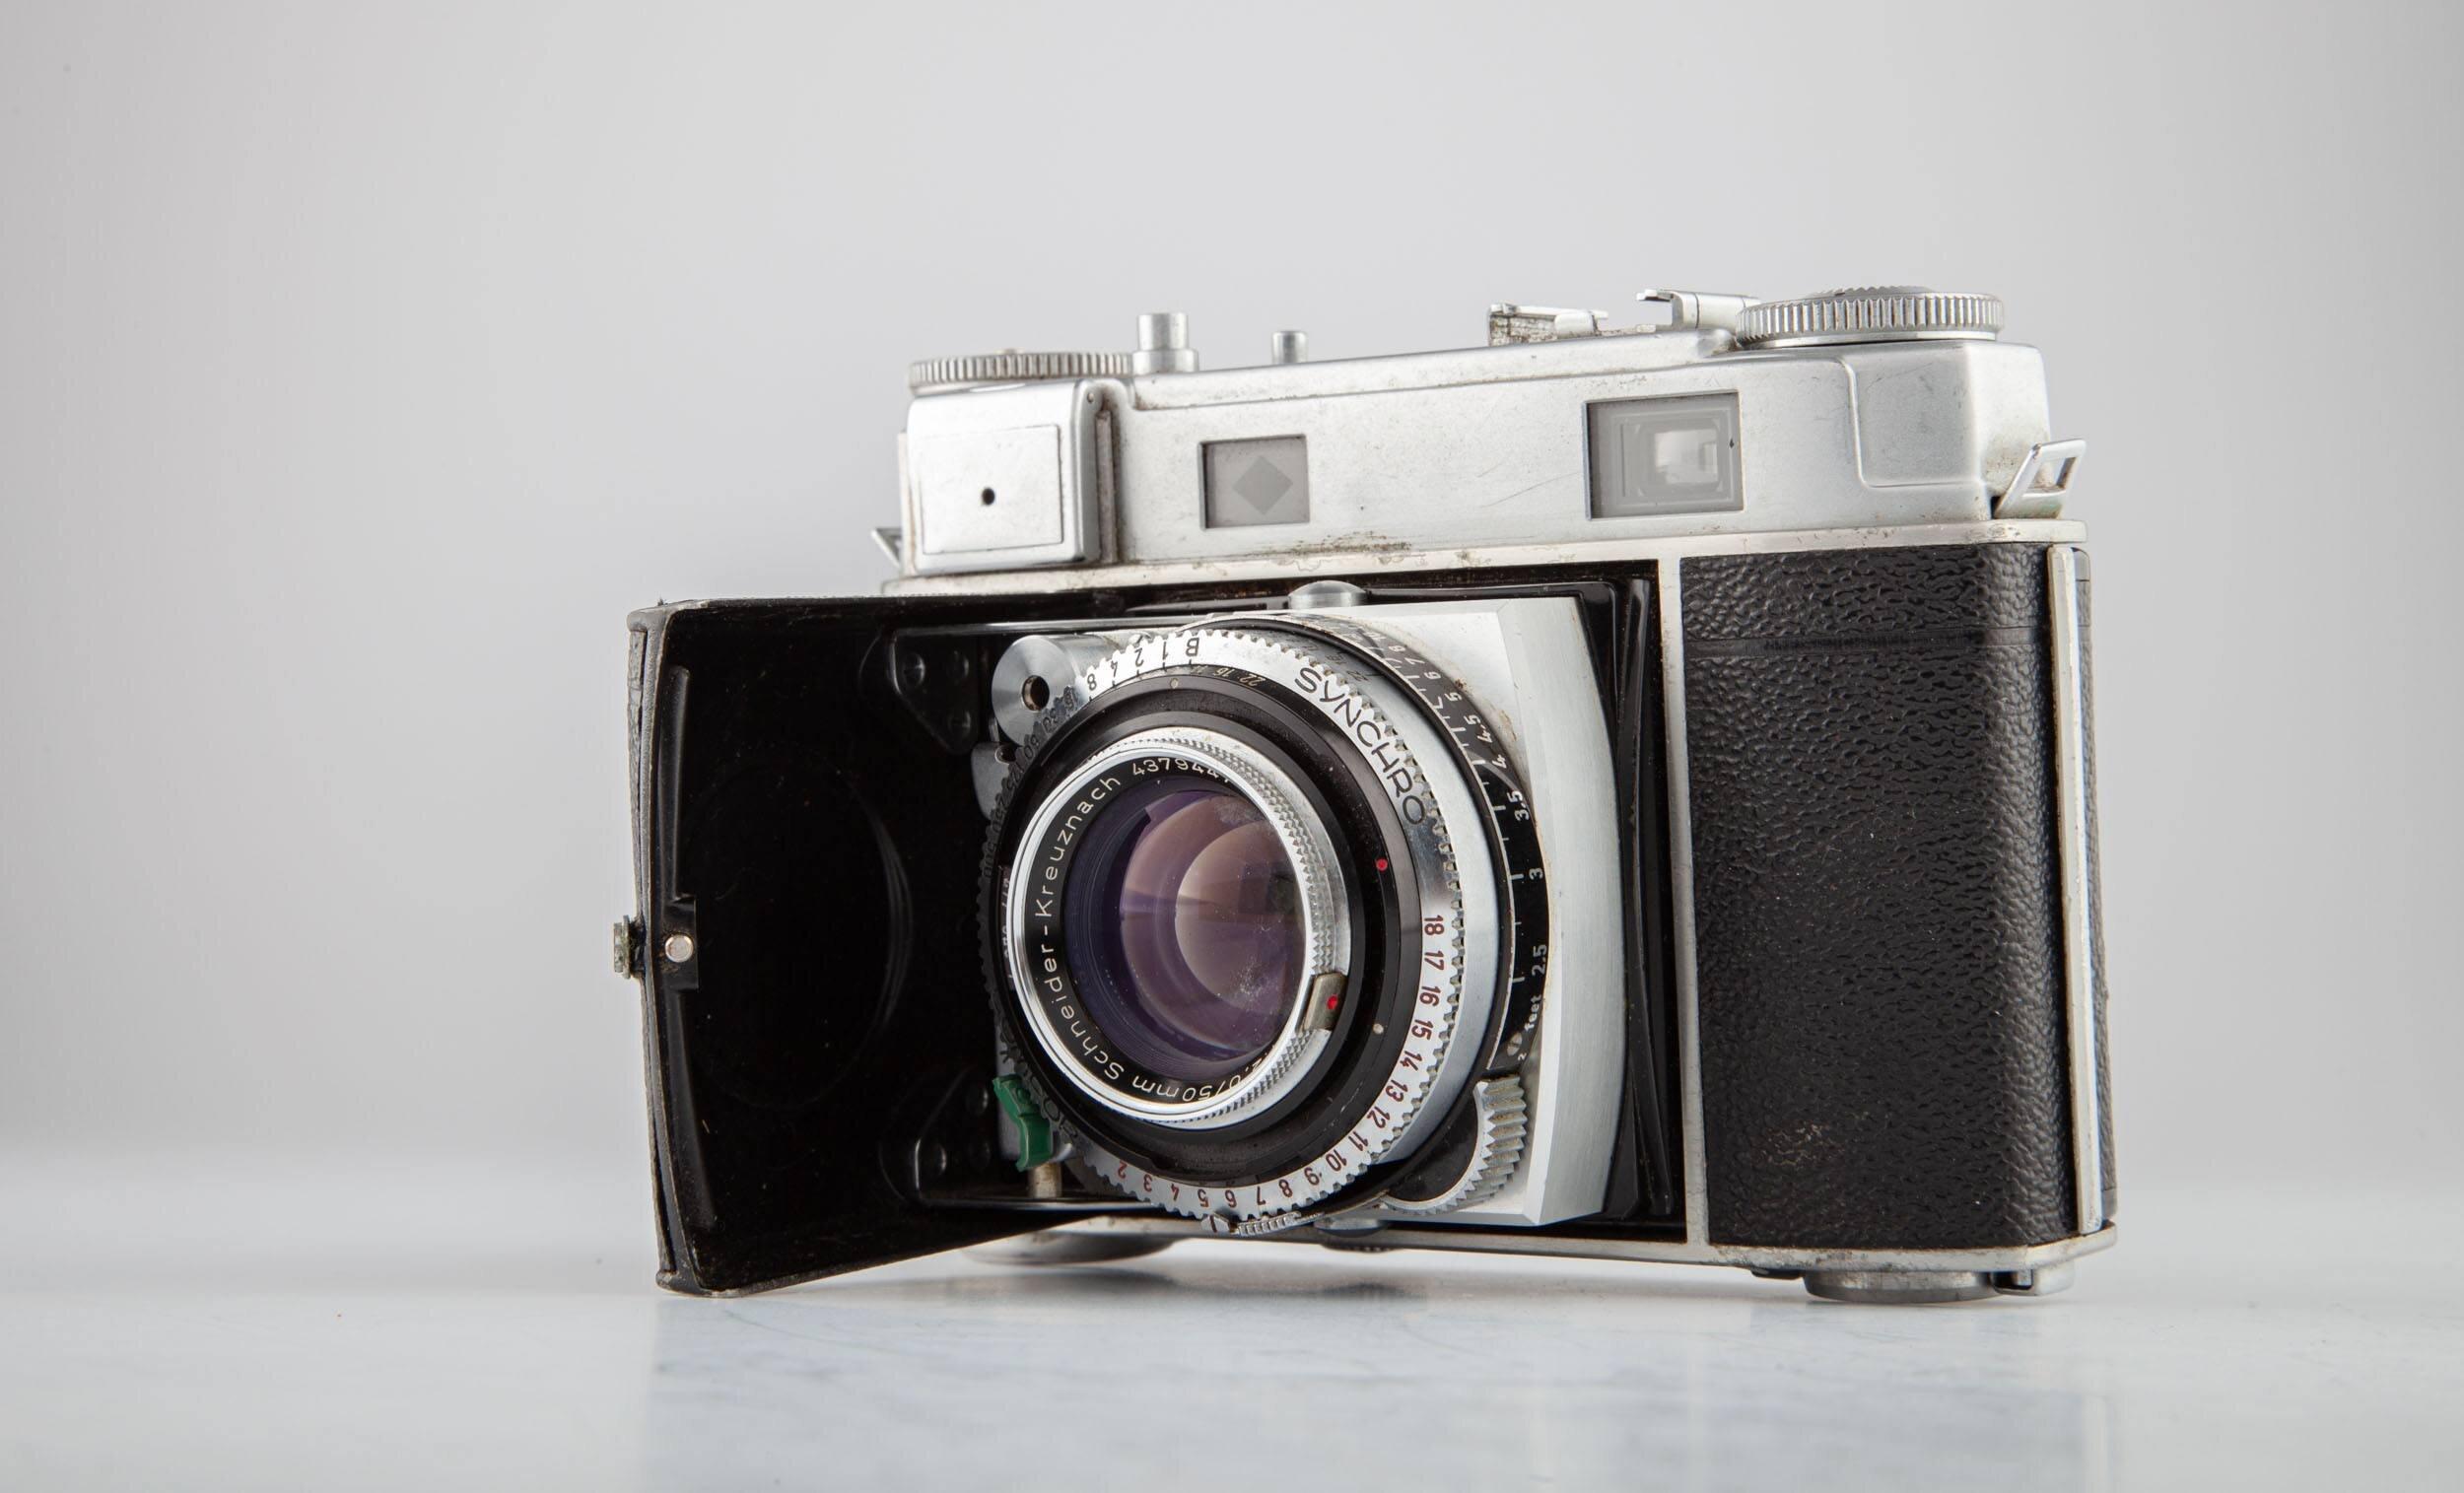 Kodak Retina IIIc + Schneider-Kreuznach Retina-Xenon C 2/50mm